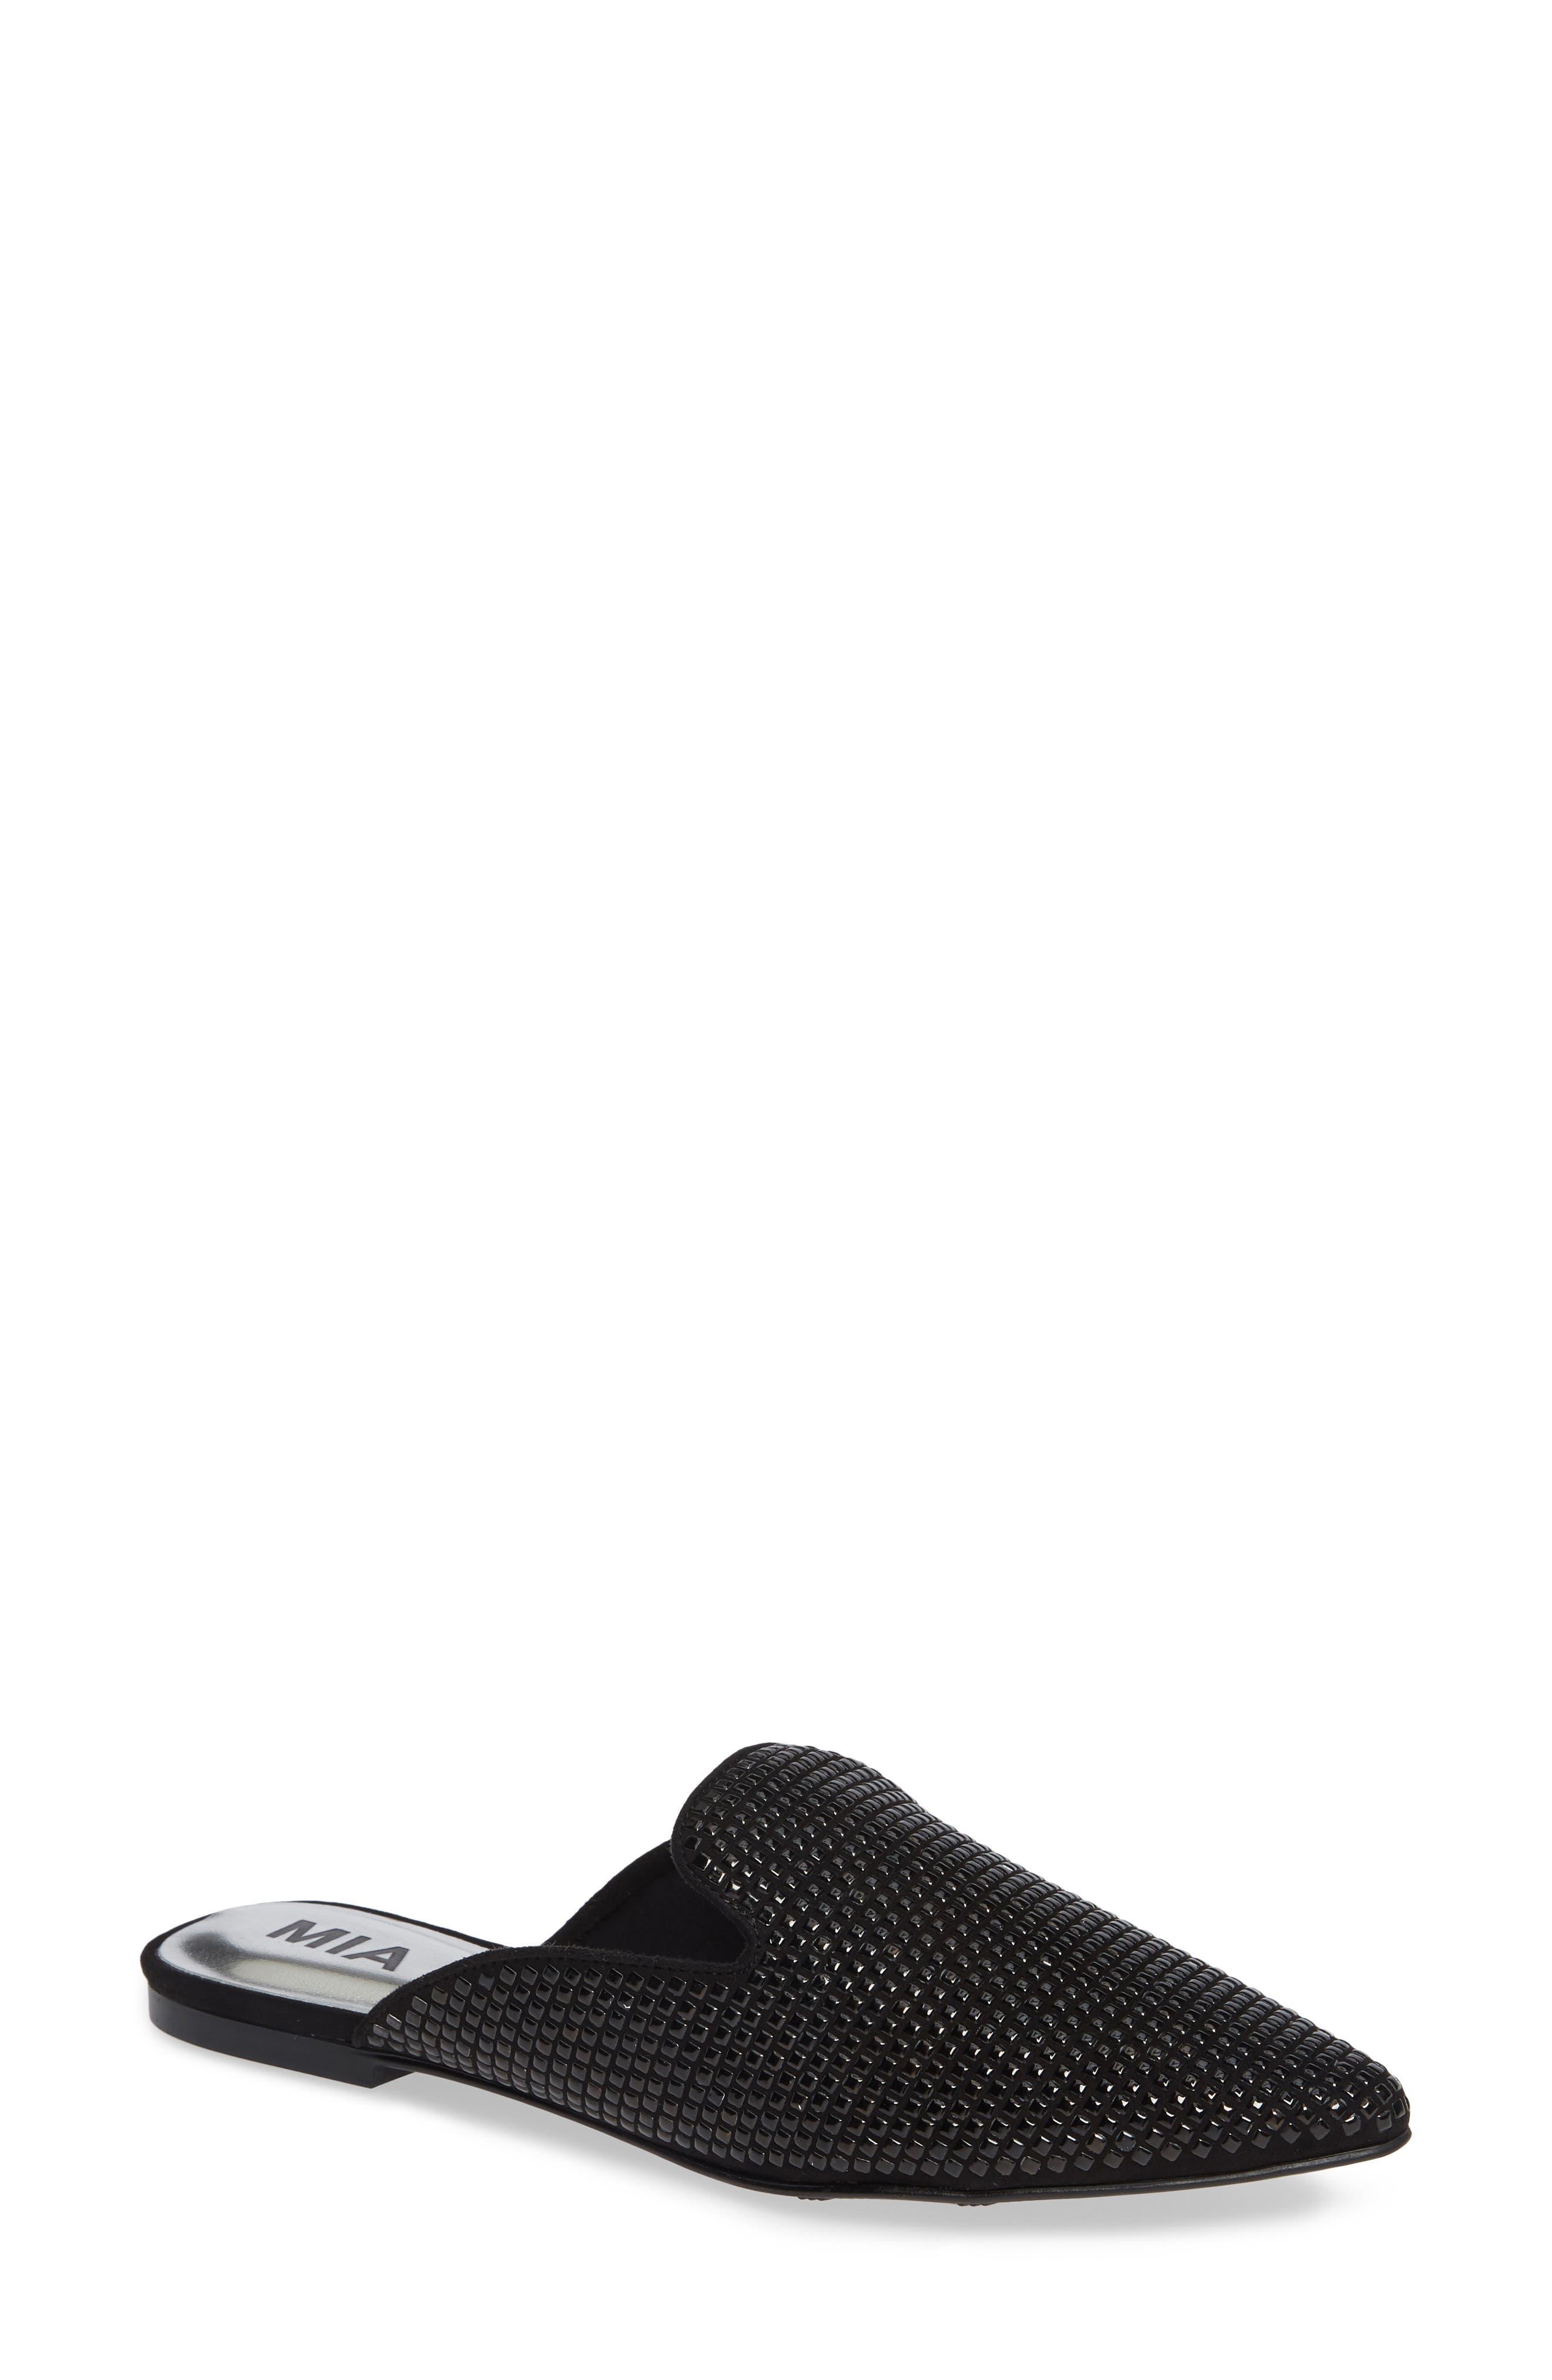 winter wardrobe black shoes